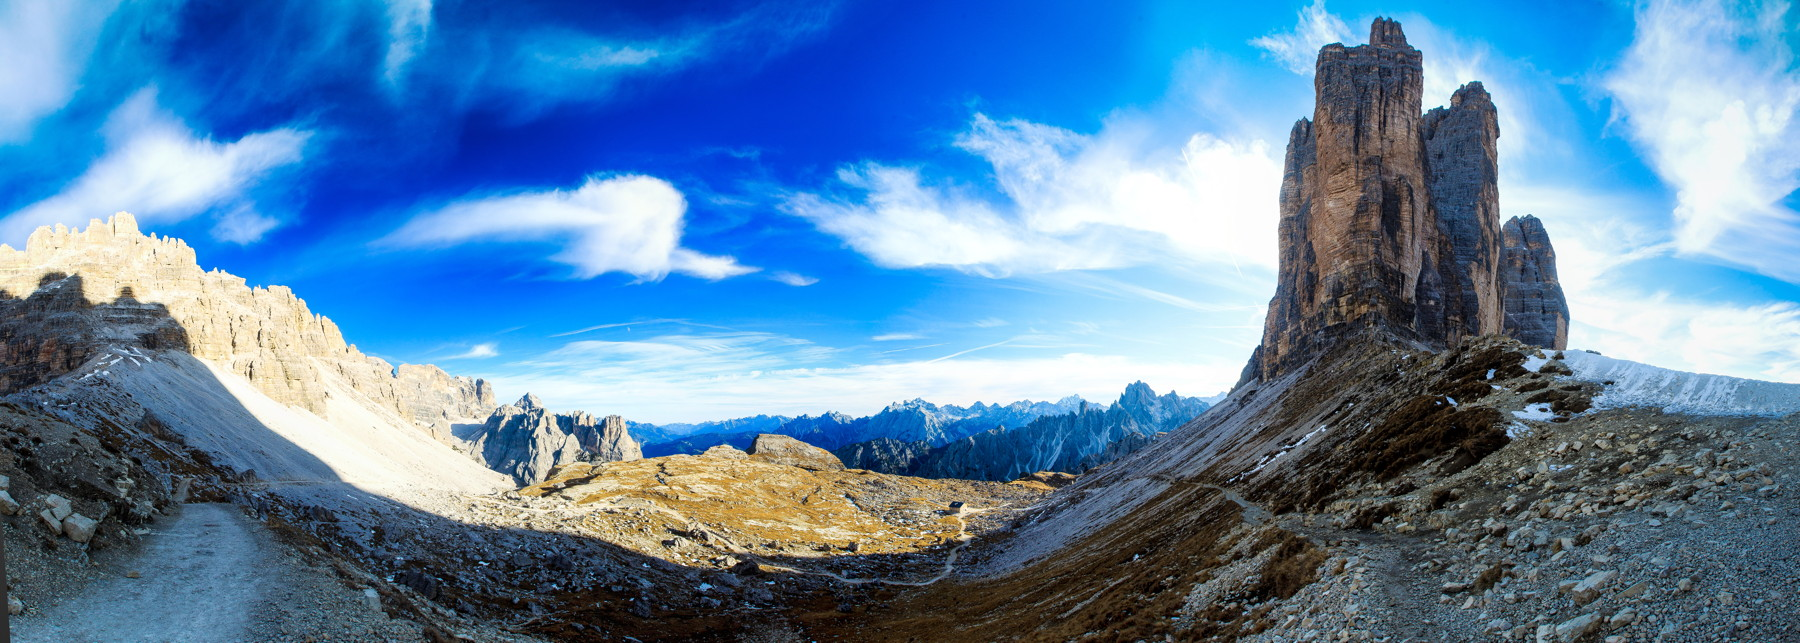 Blog-Dolomiten-12